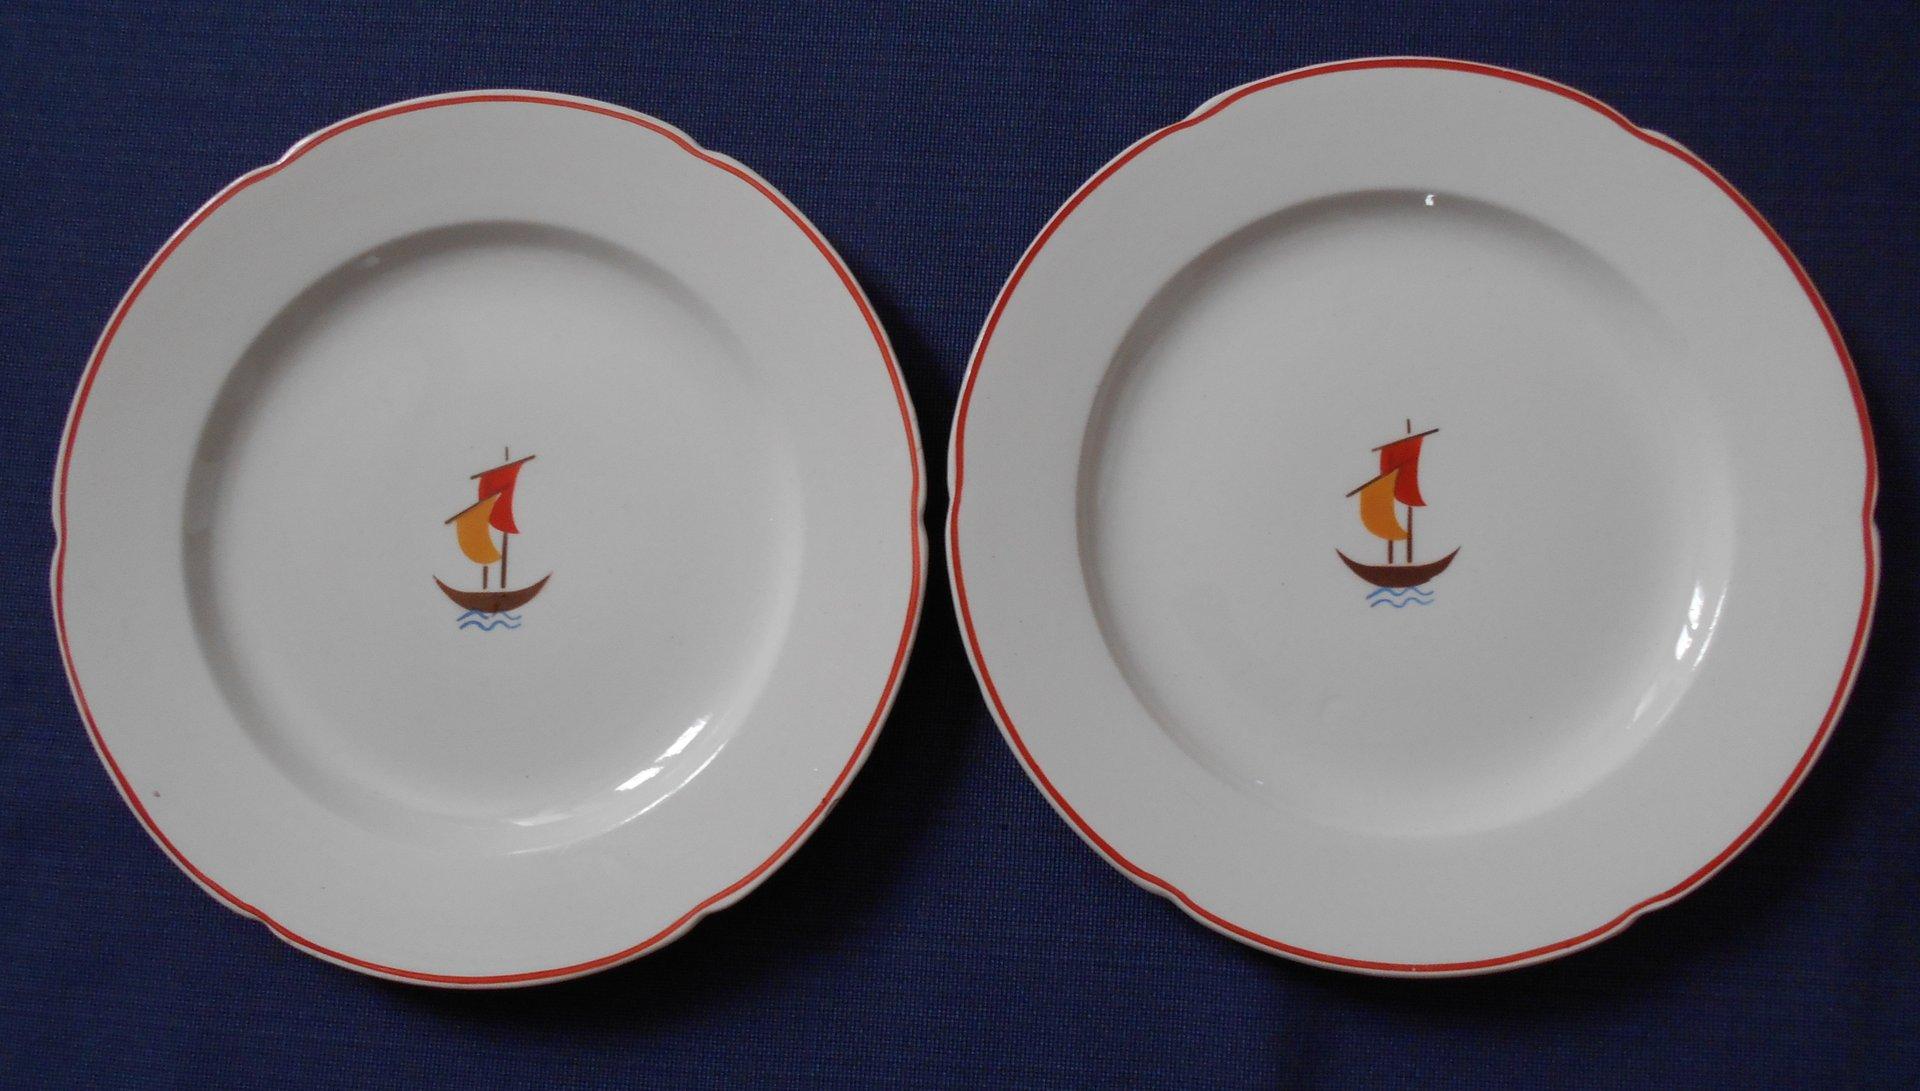 Keramik Set von Gio Ponti fr Richard Ginori 1936 4er